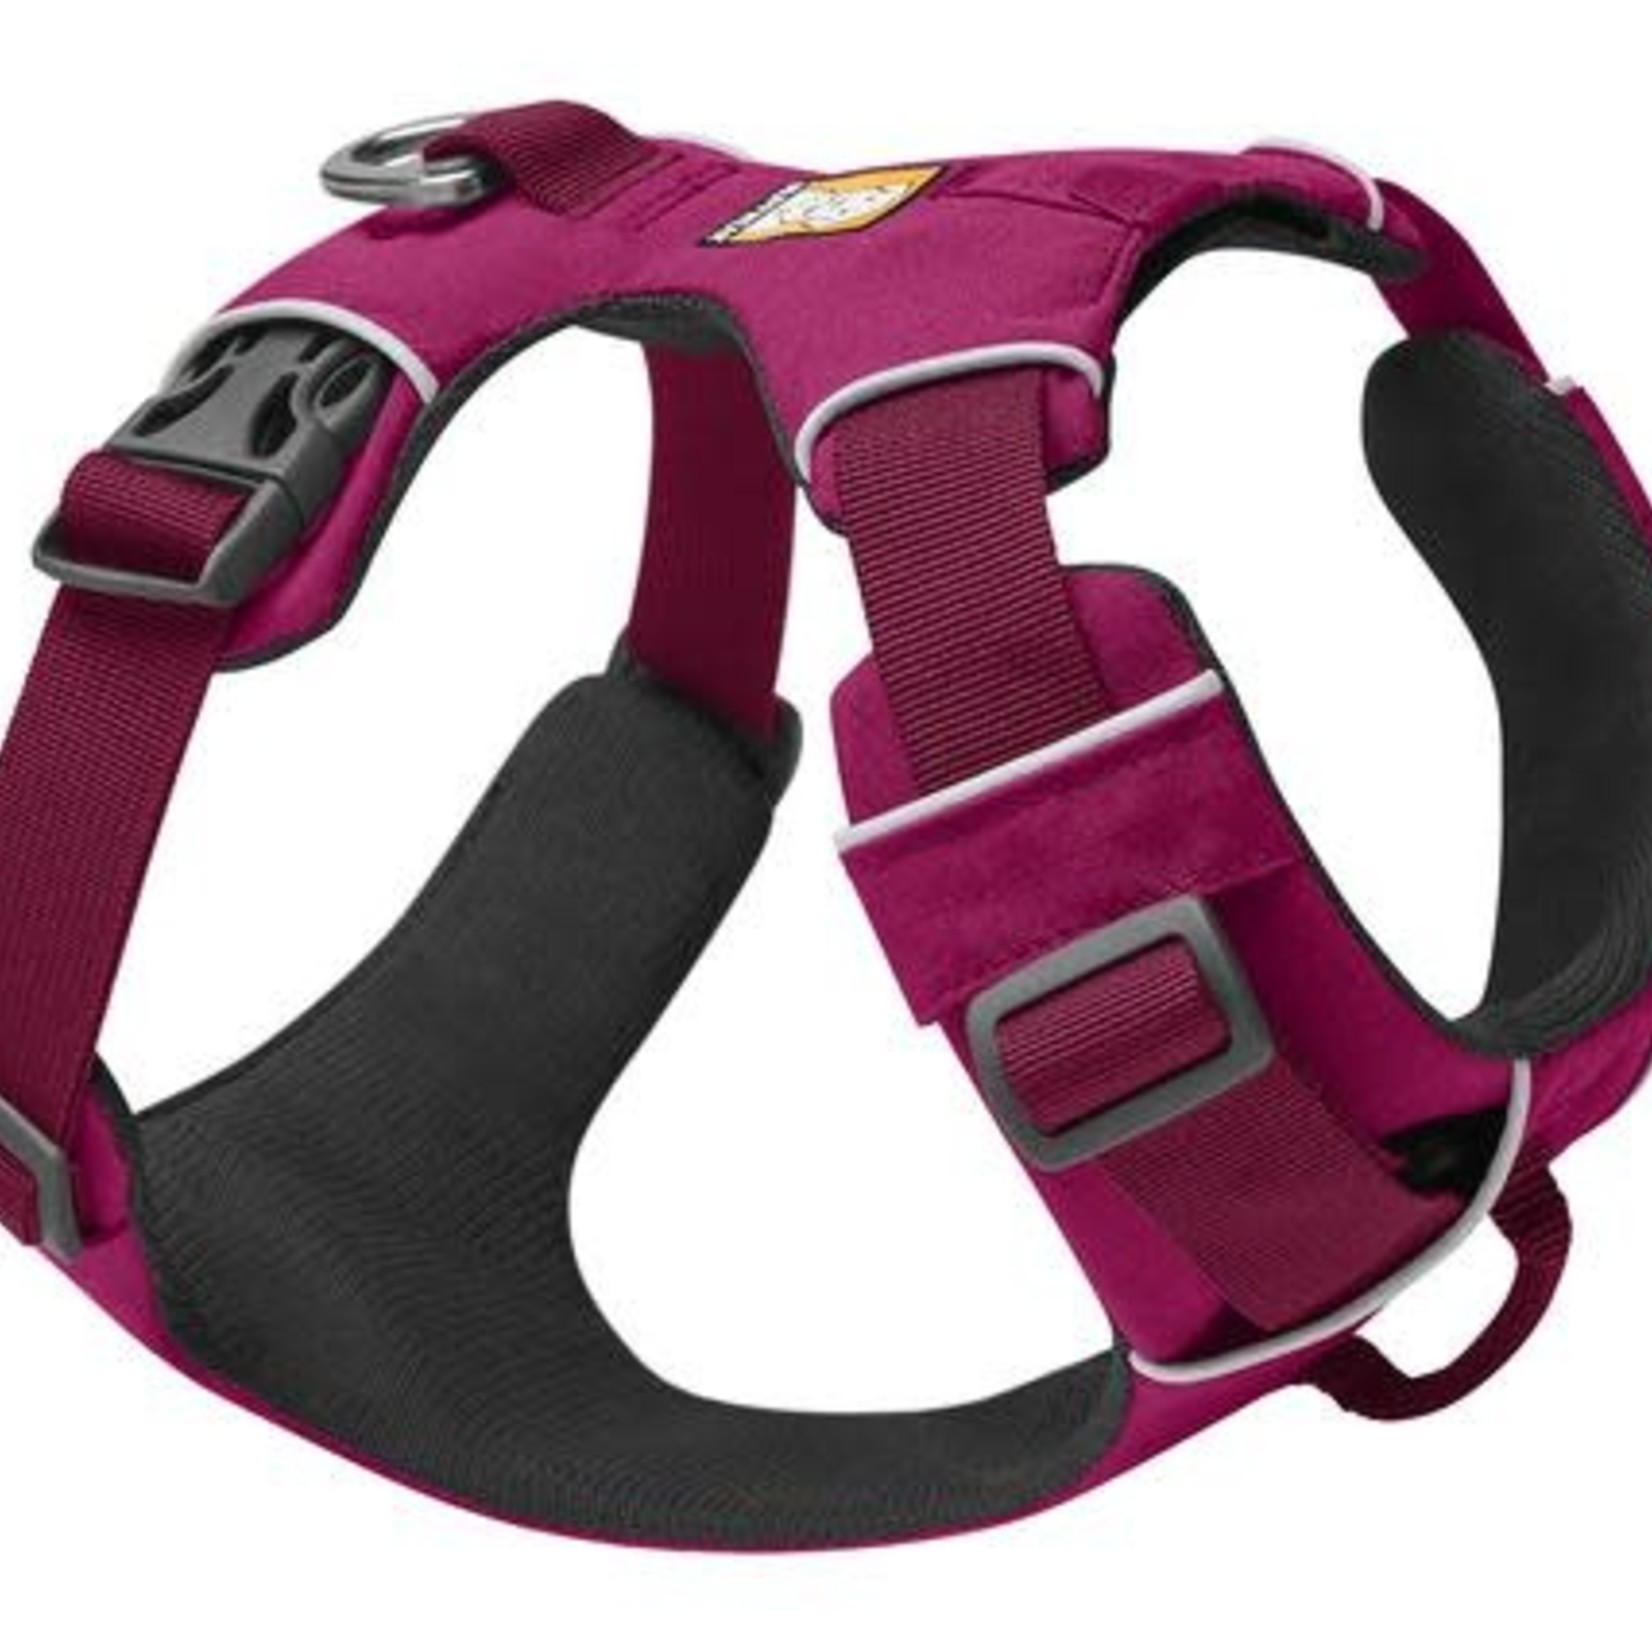 Ruff Wear Ruffwear Front Range Harness Hibiscus Pink X-Small